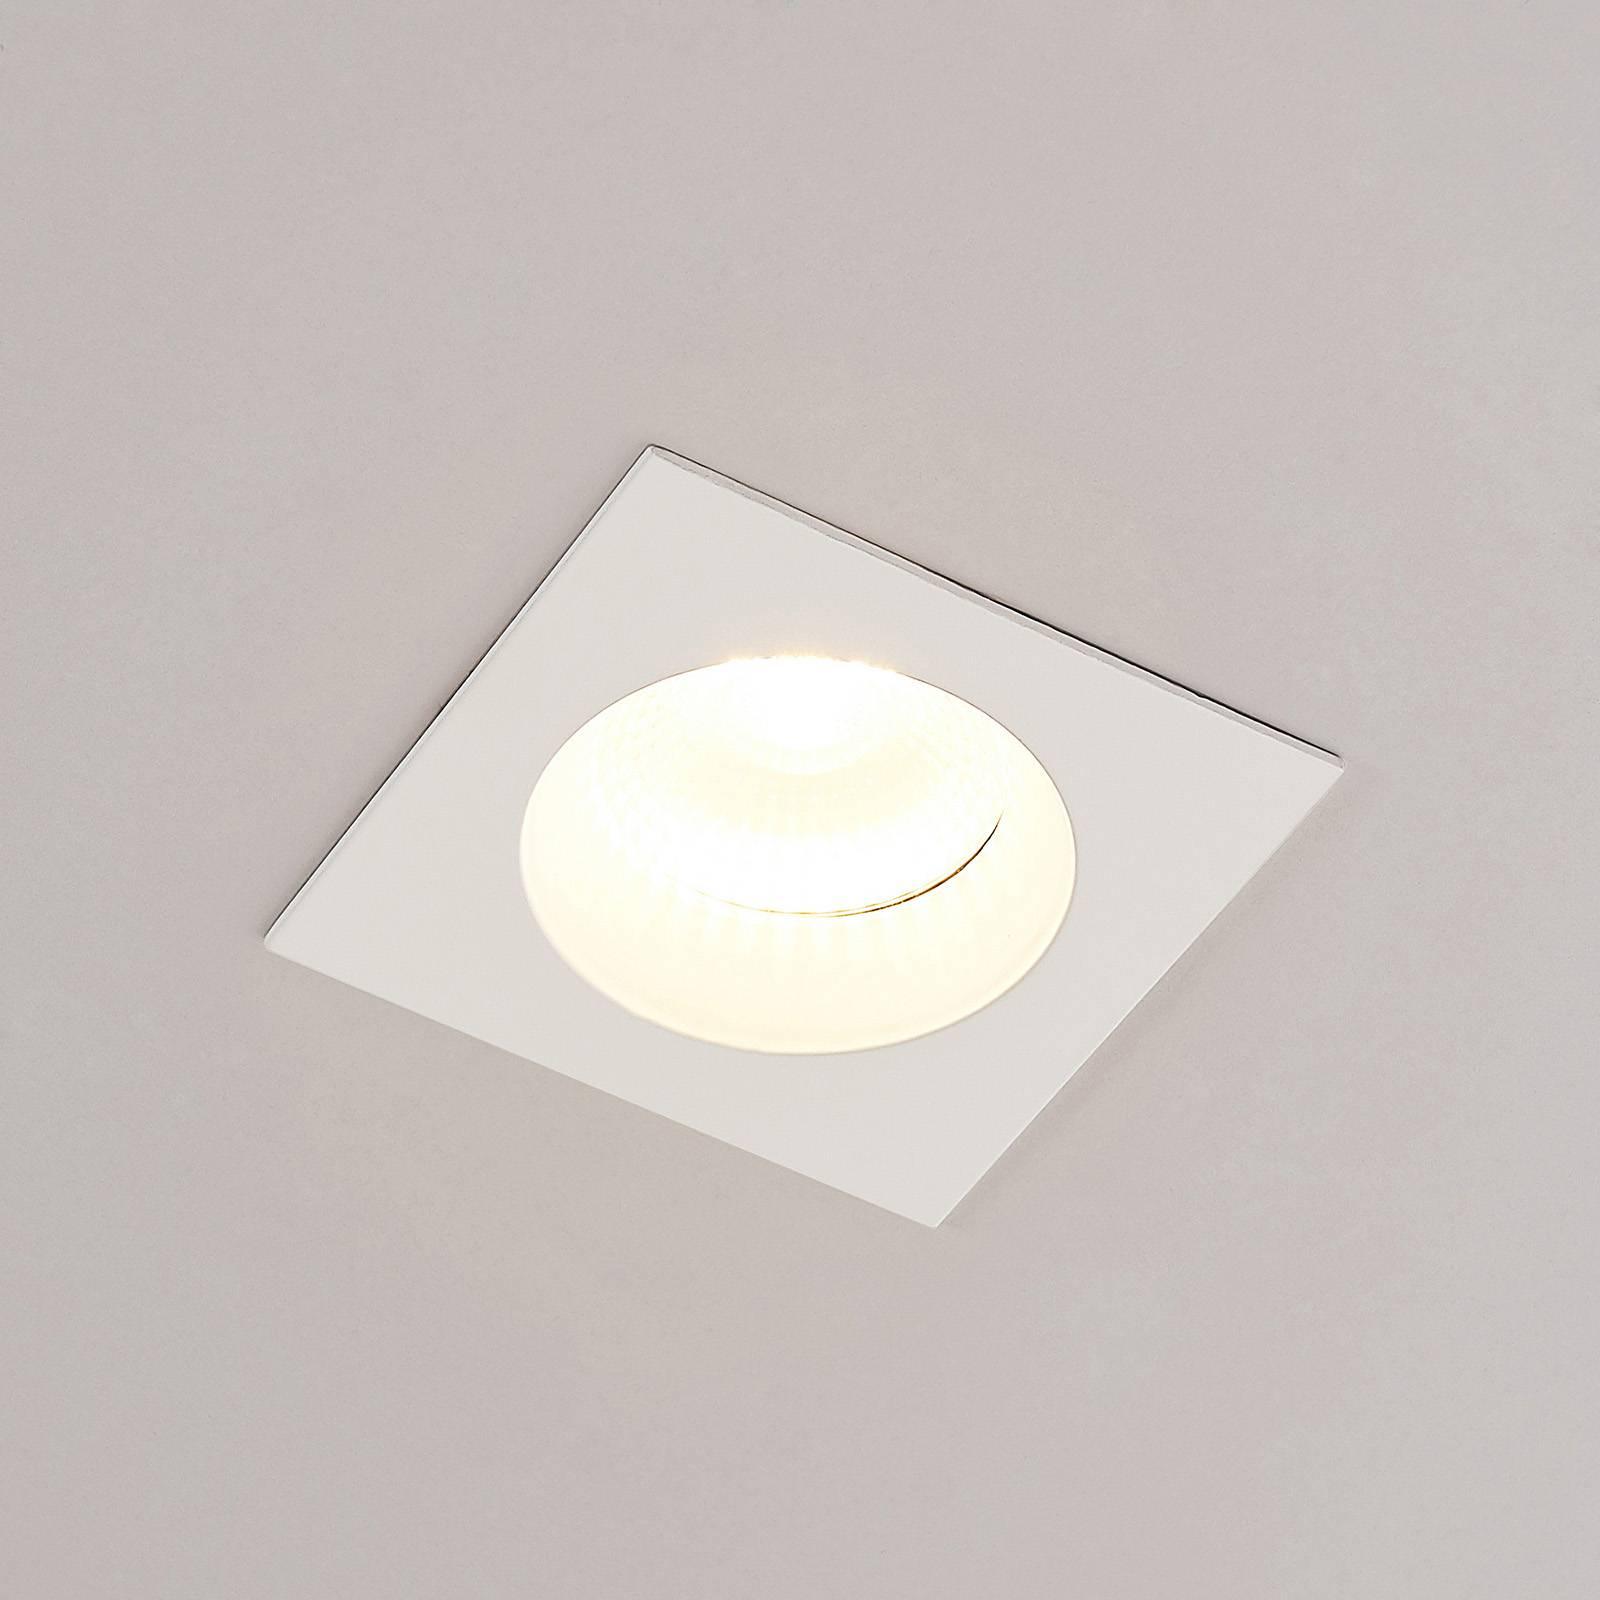 Arcchio Urdin LED-kohdevalo kulmikas IP65, 10,6W